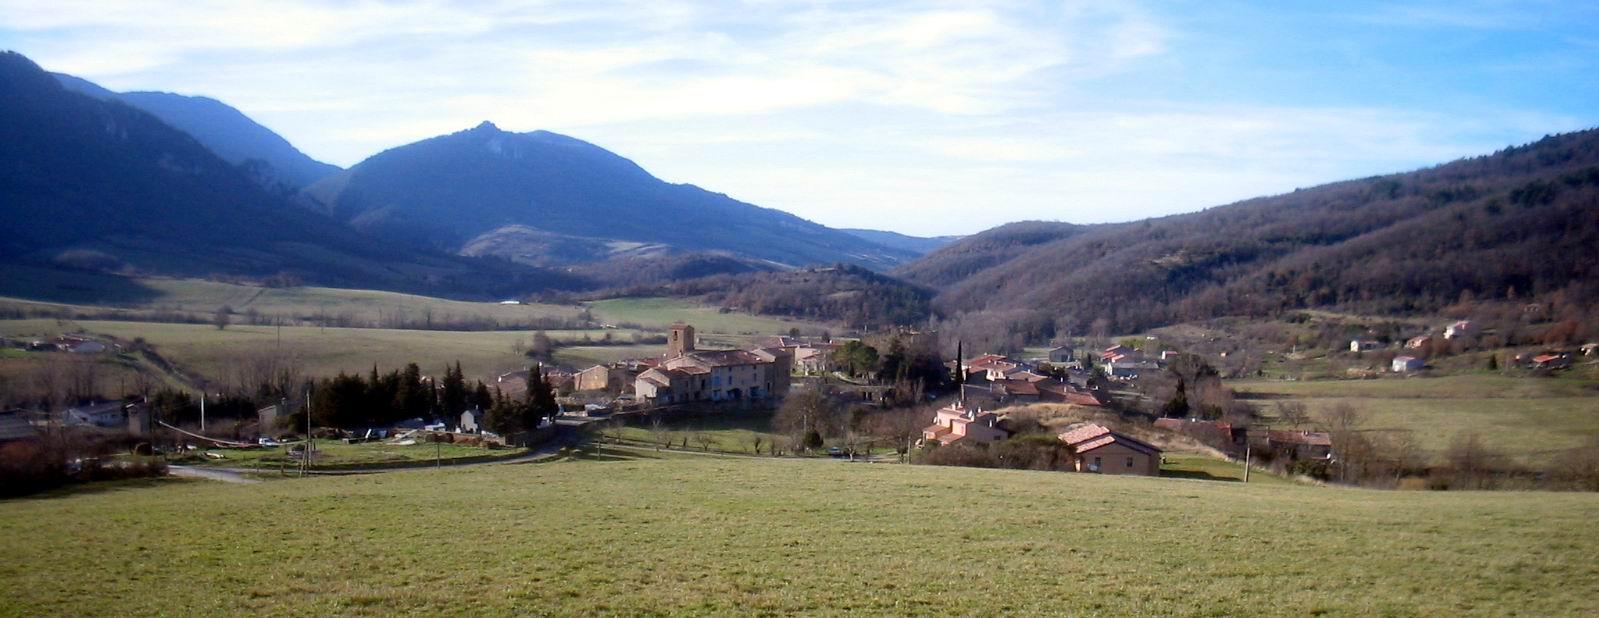 Pic de Burgarach, France